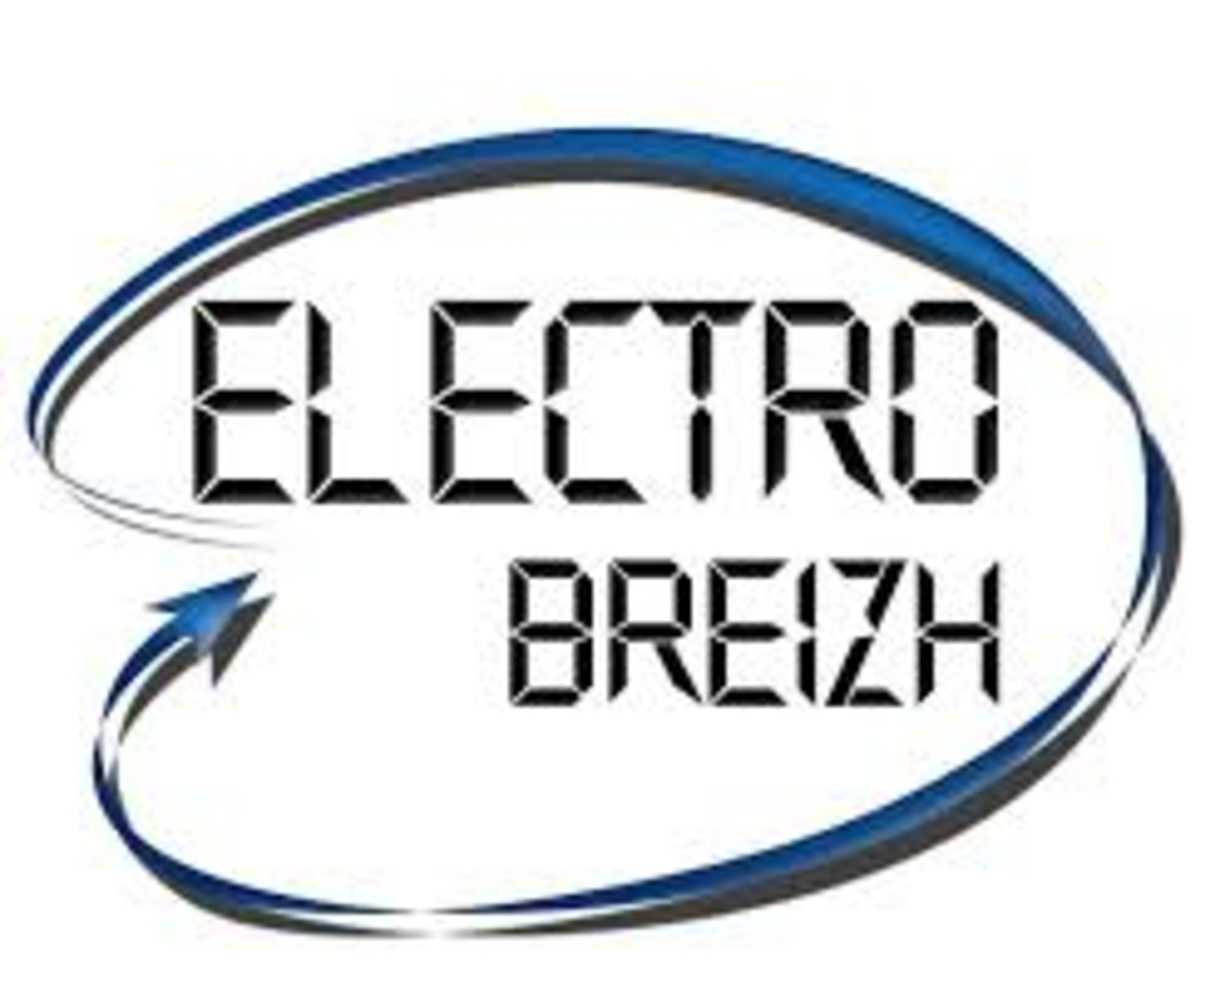 electrobreizh